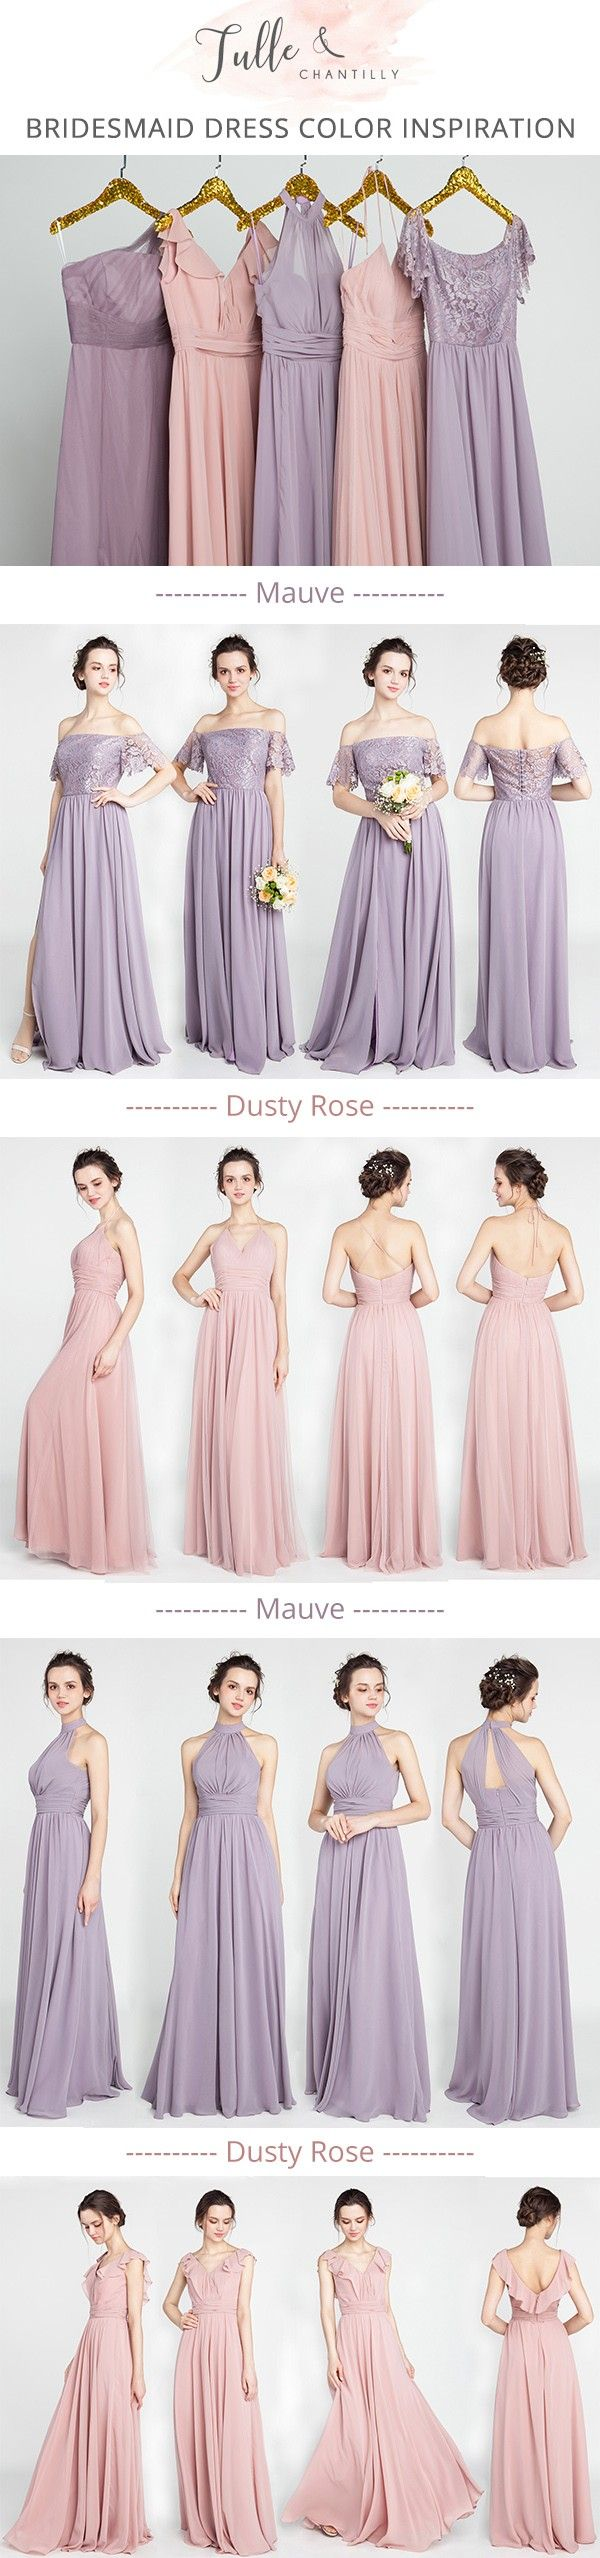 mismatched mauve purple and dusty pink bridesmaid dresses